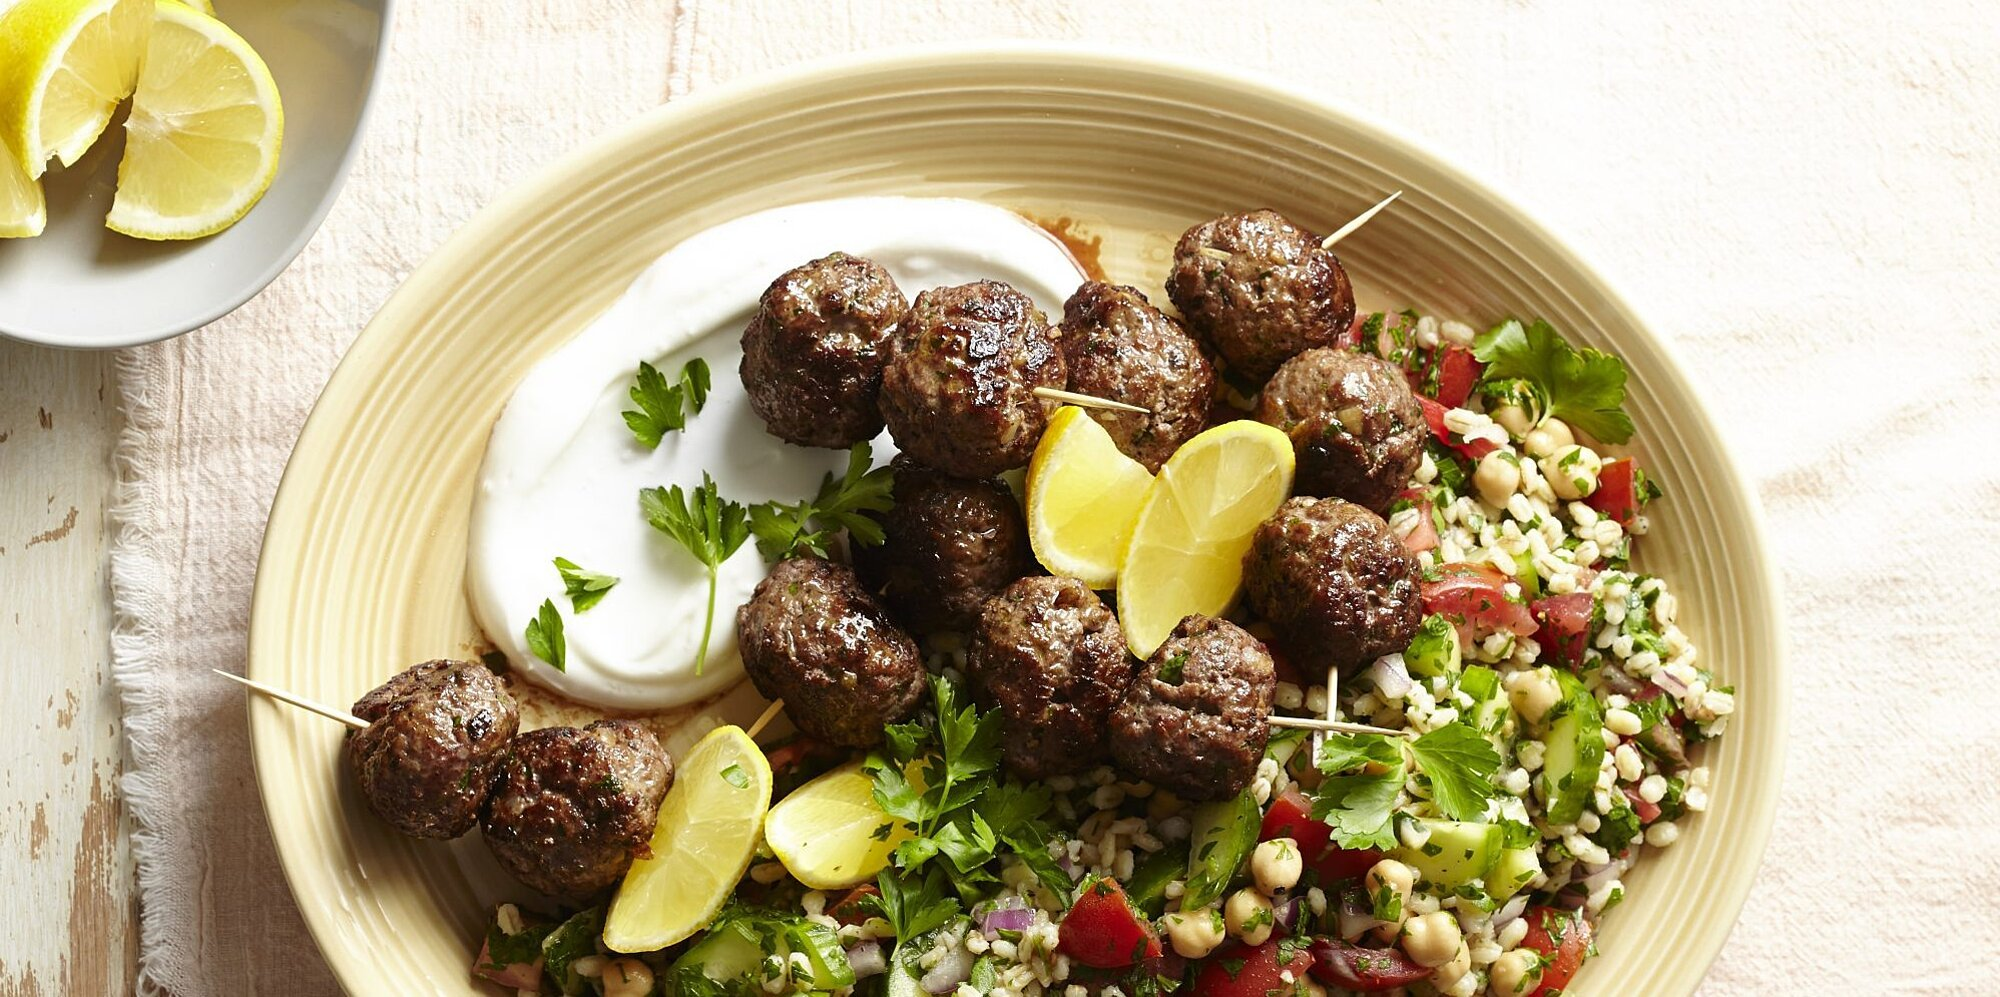 10 Essential Tools for Preparing Middle Eastern Cuisine